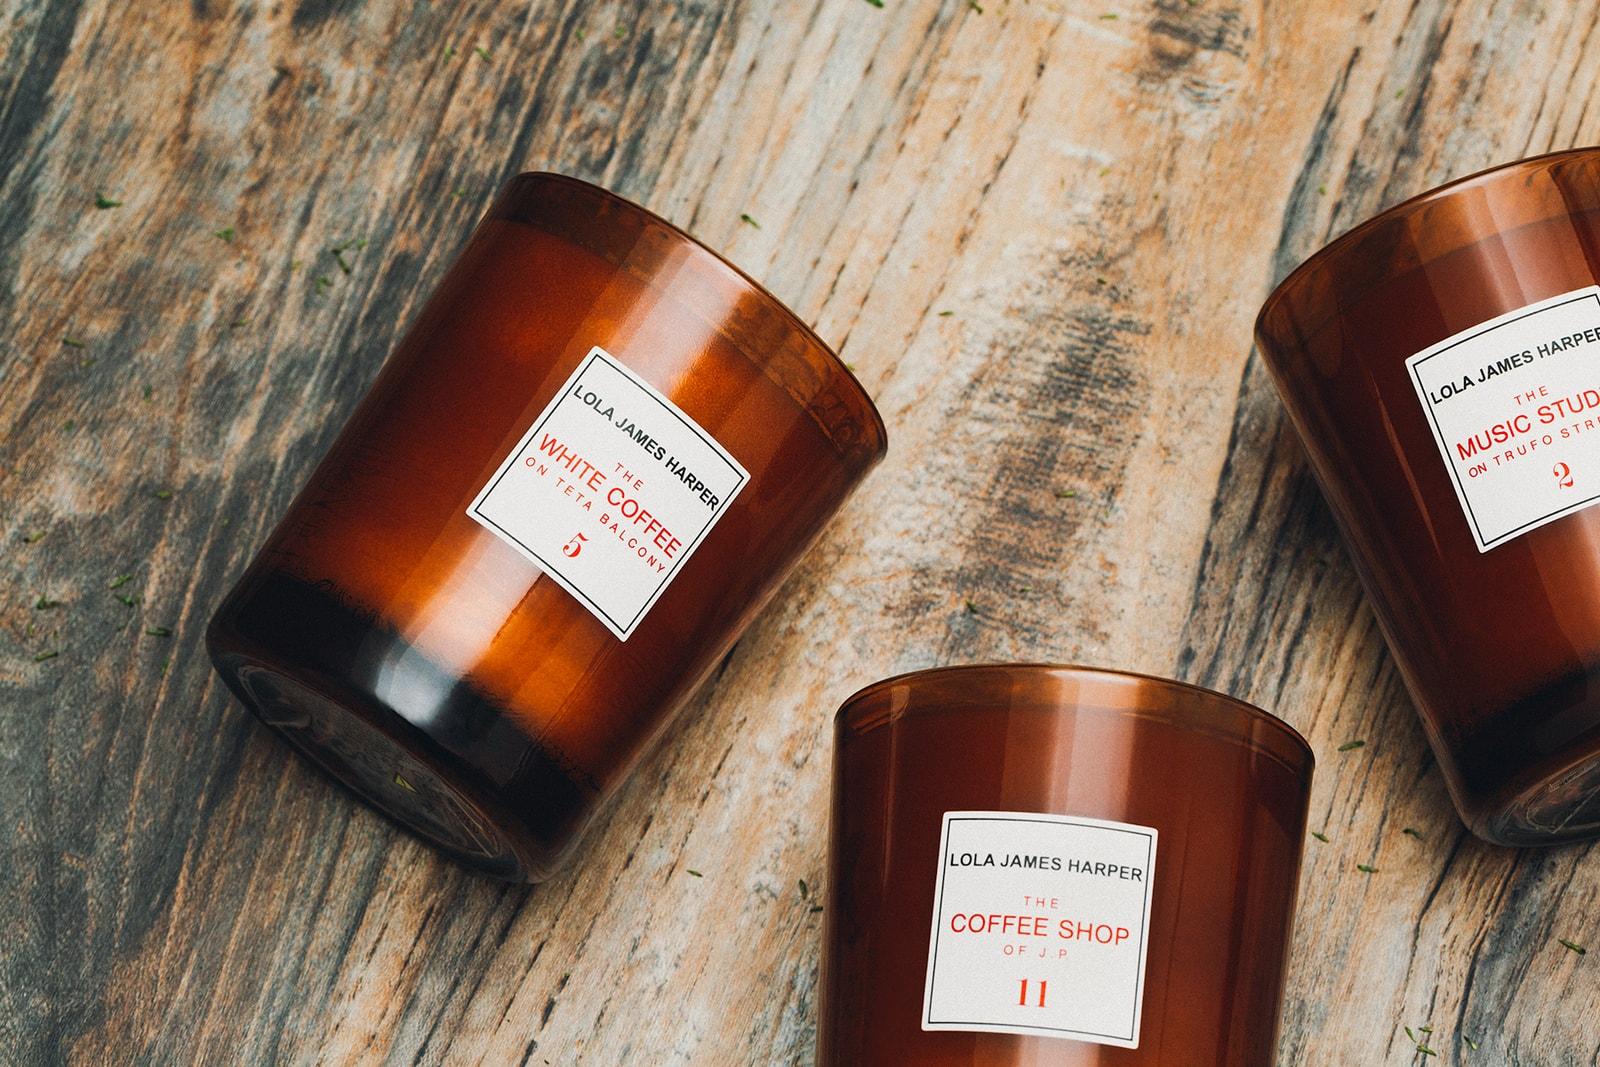 lola james harper scented candles review home decor paris